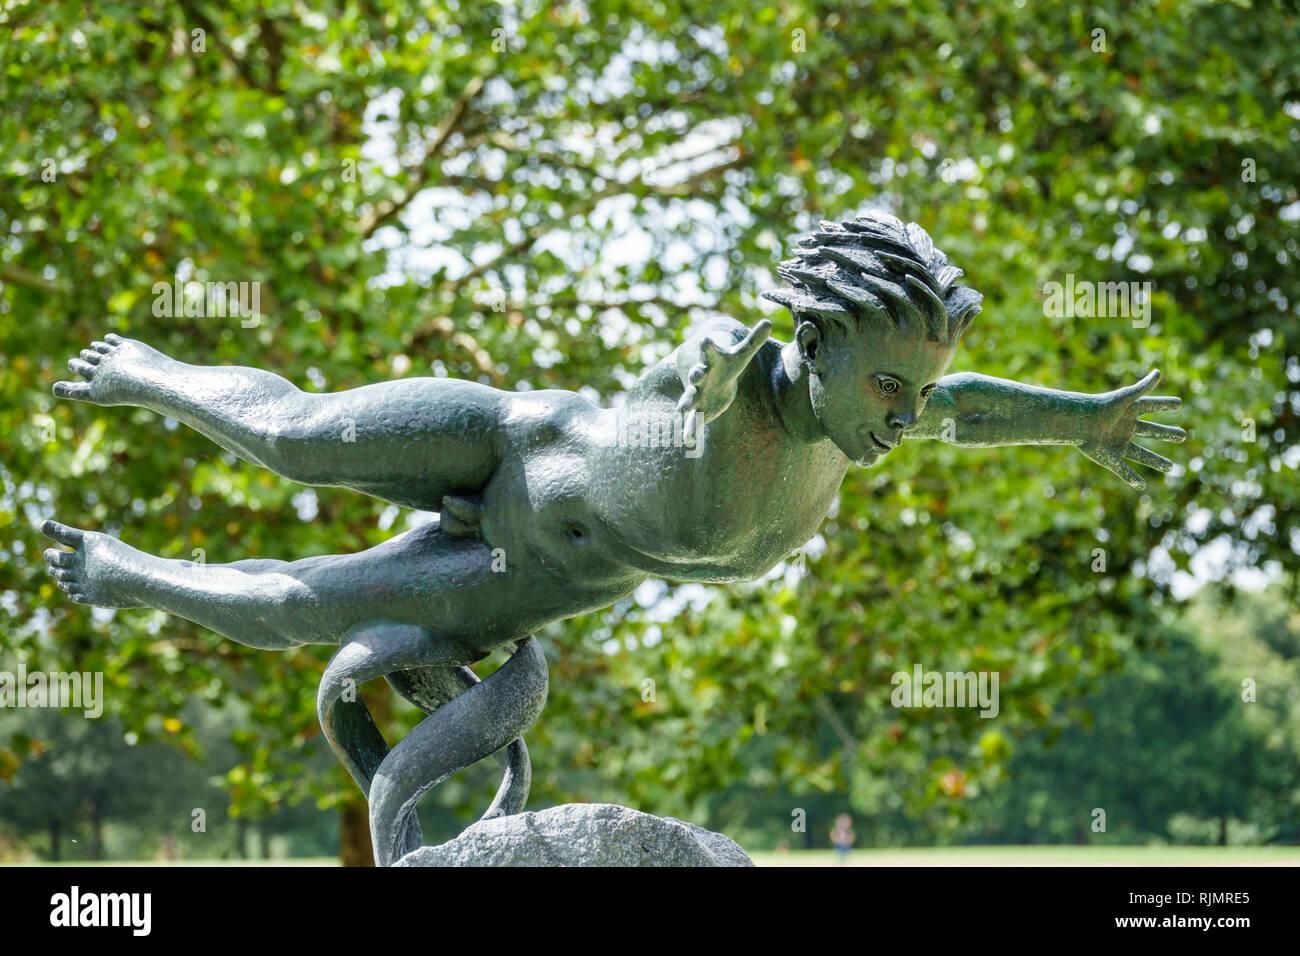 United Kingdom Great Britain England London Hyde Park public park Joy of Life fountain by Huxley-Jones bronze sculpture - Stock Image